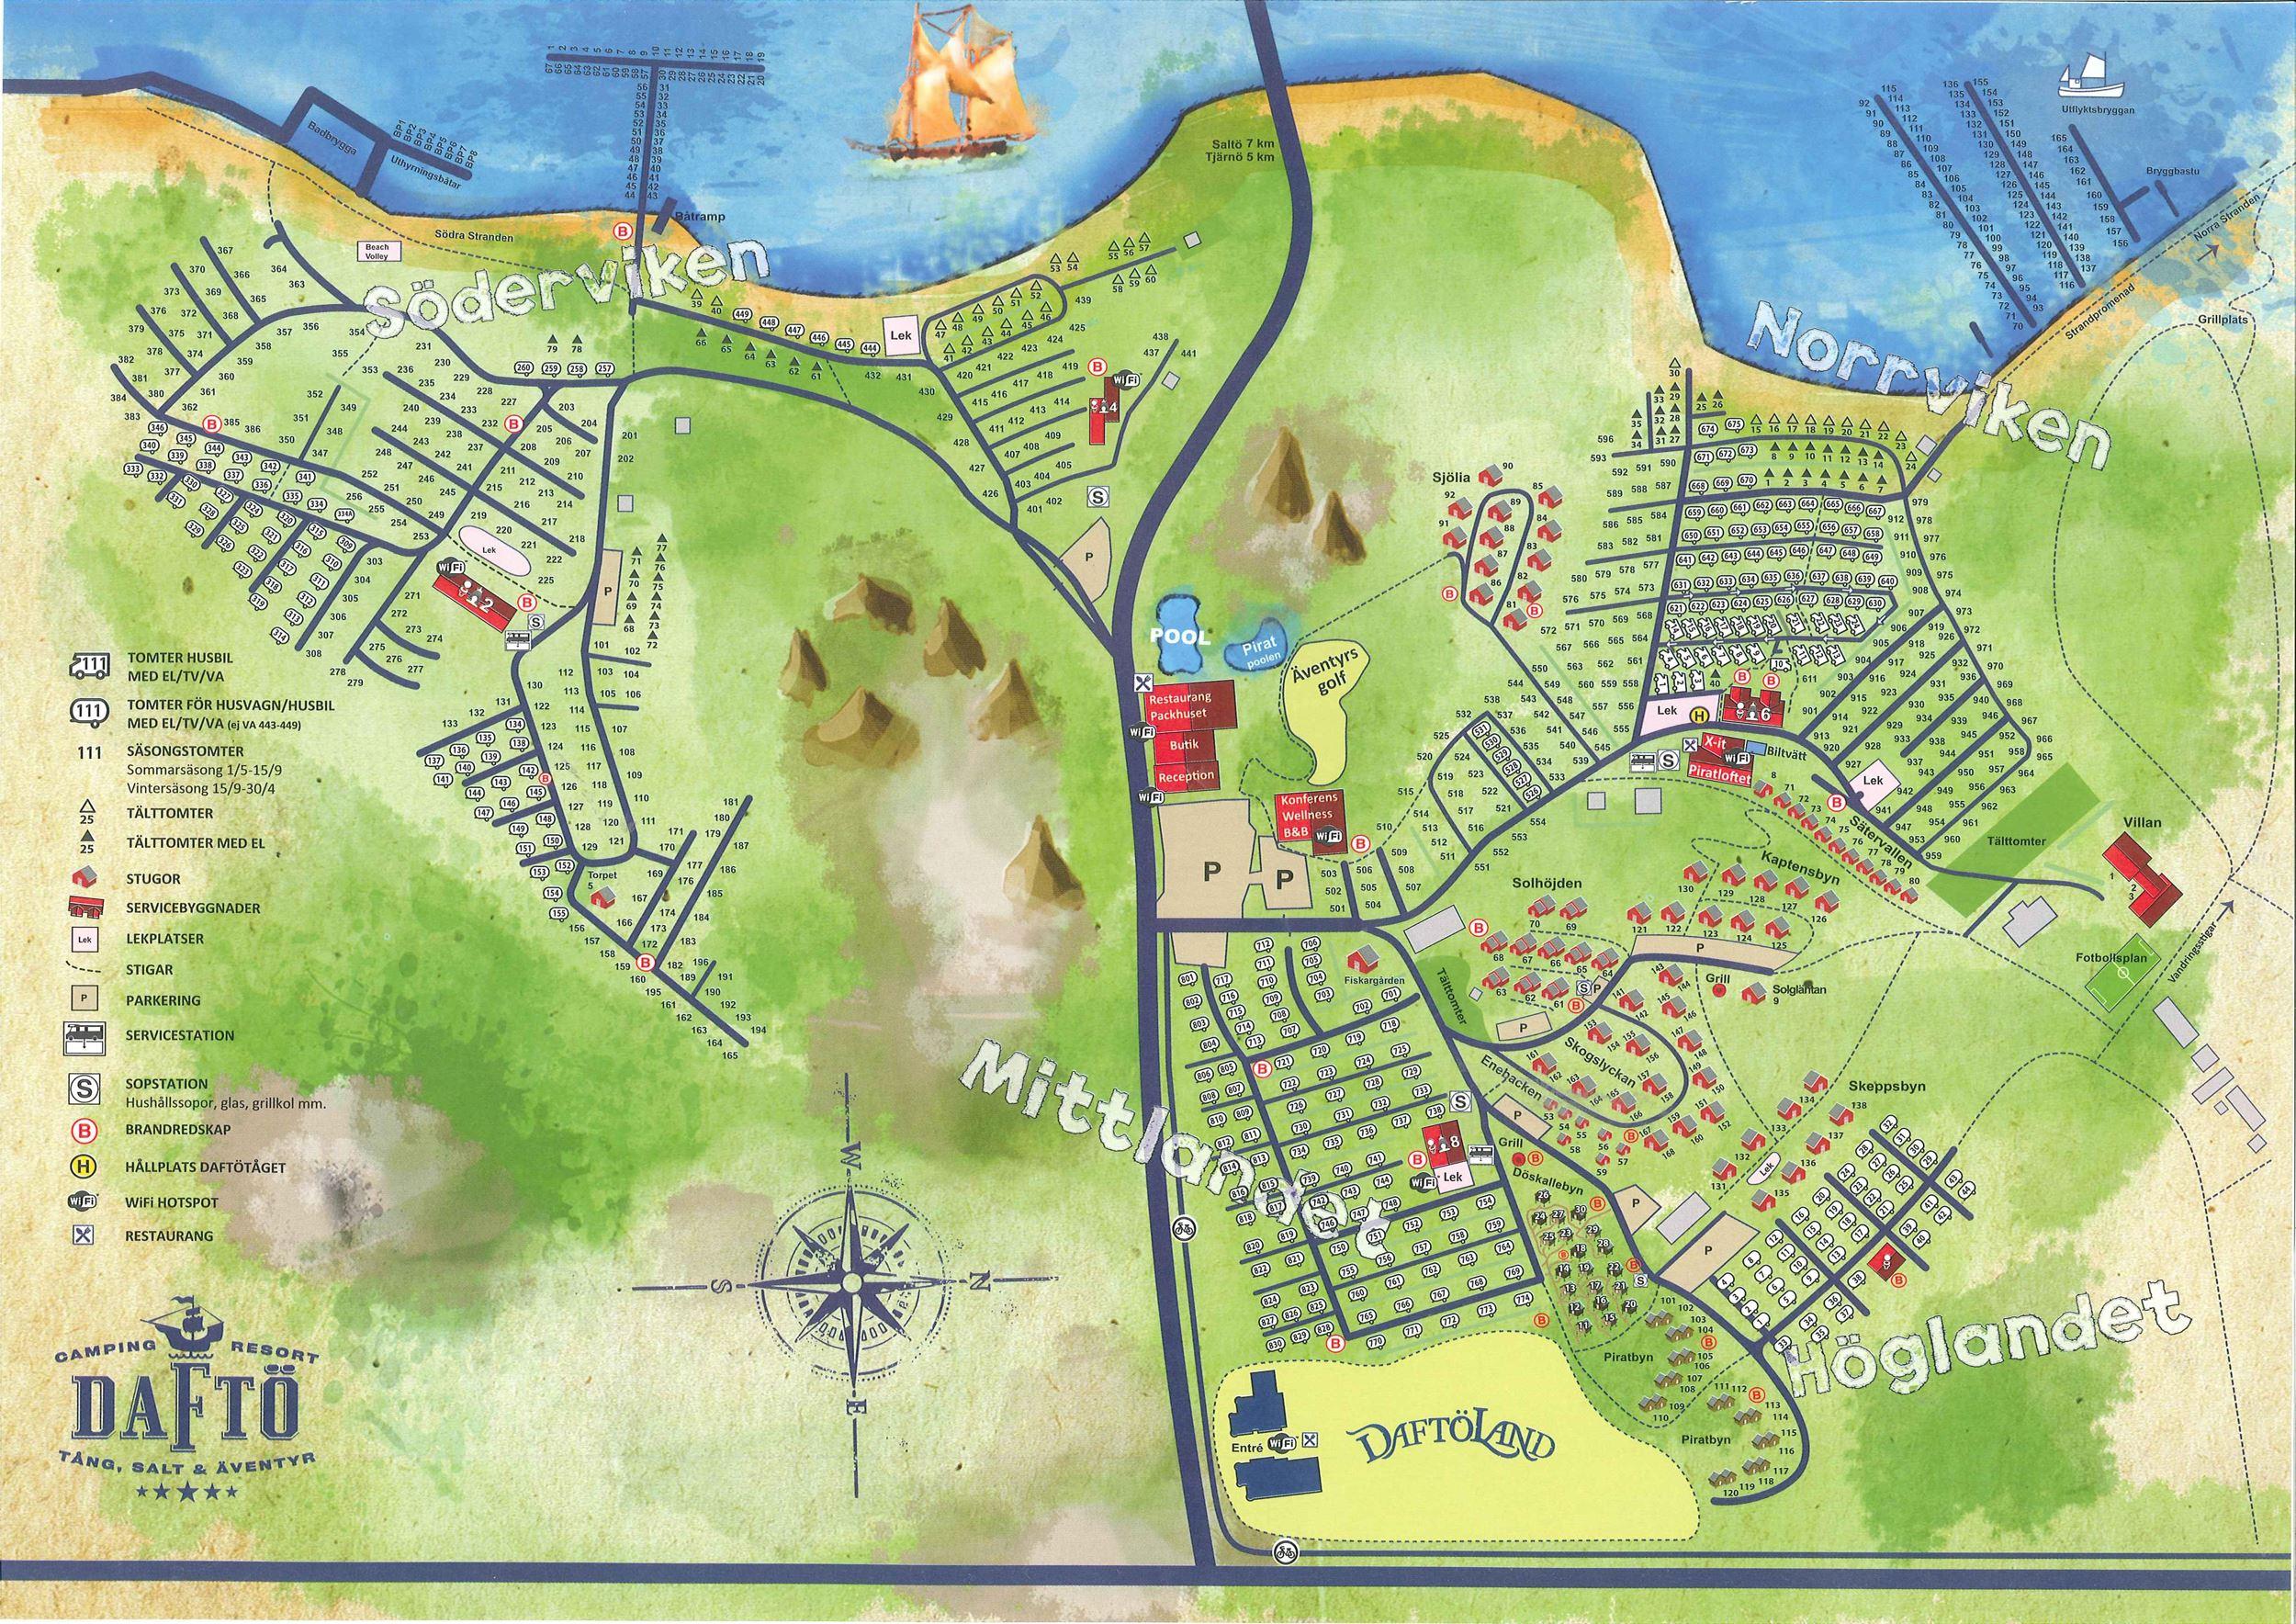 kart over daftø camping Daftö Camping Resort / Stugor, Bilder, Stugbyar, Strömstad  kart over daftø camping